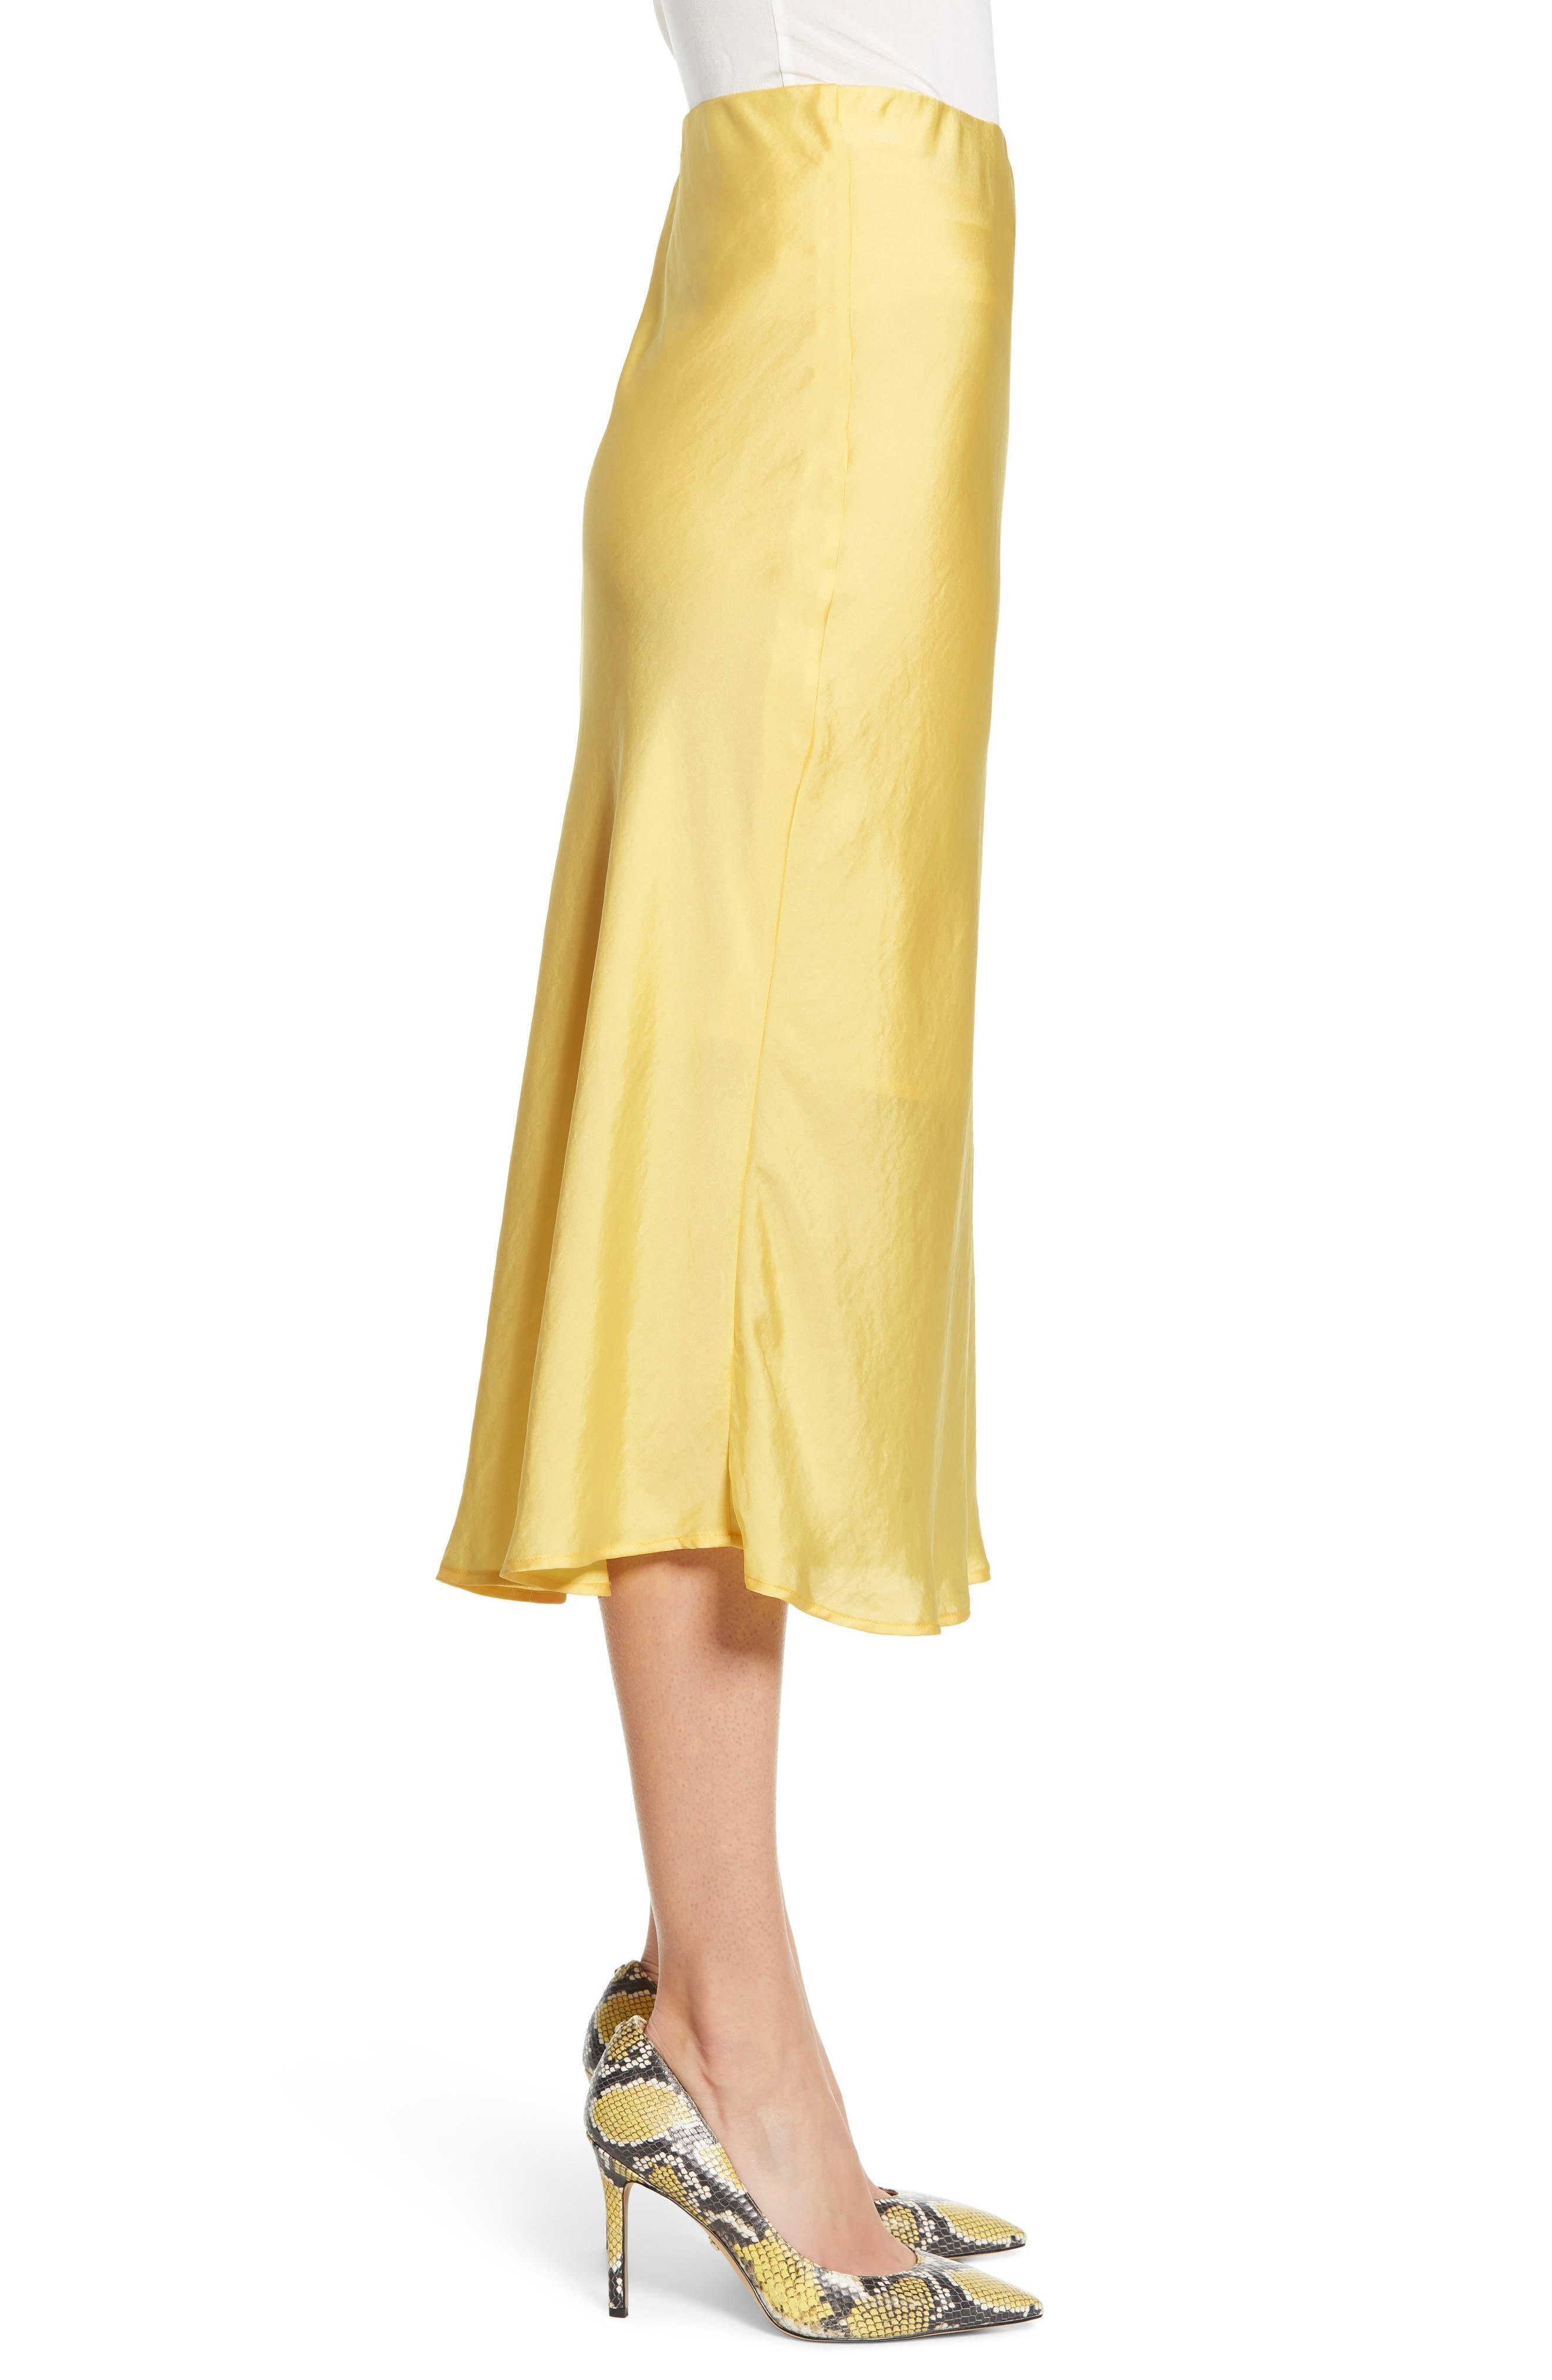 LEITH, Satin Midi Skirt, Alternate thumbnail 3, color, YELLOW MERINGUE